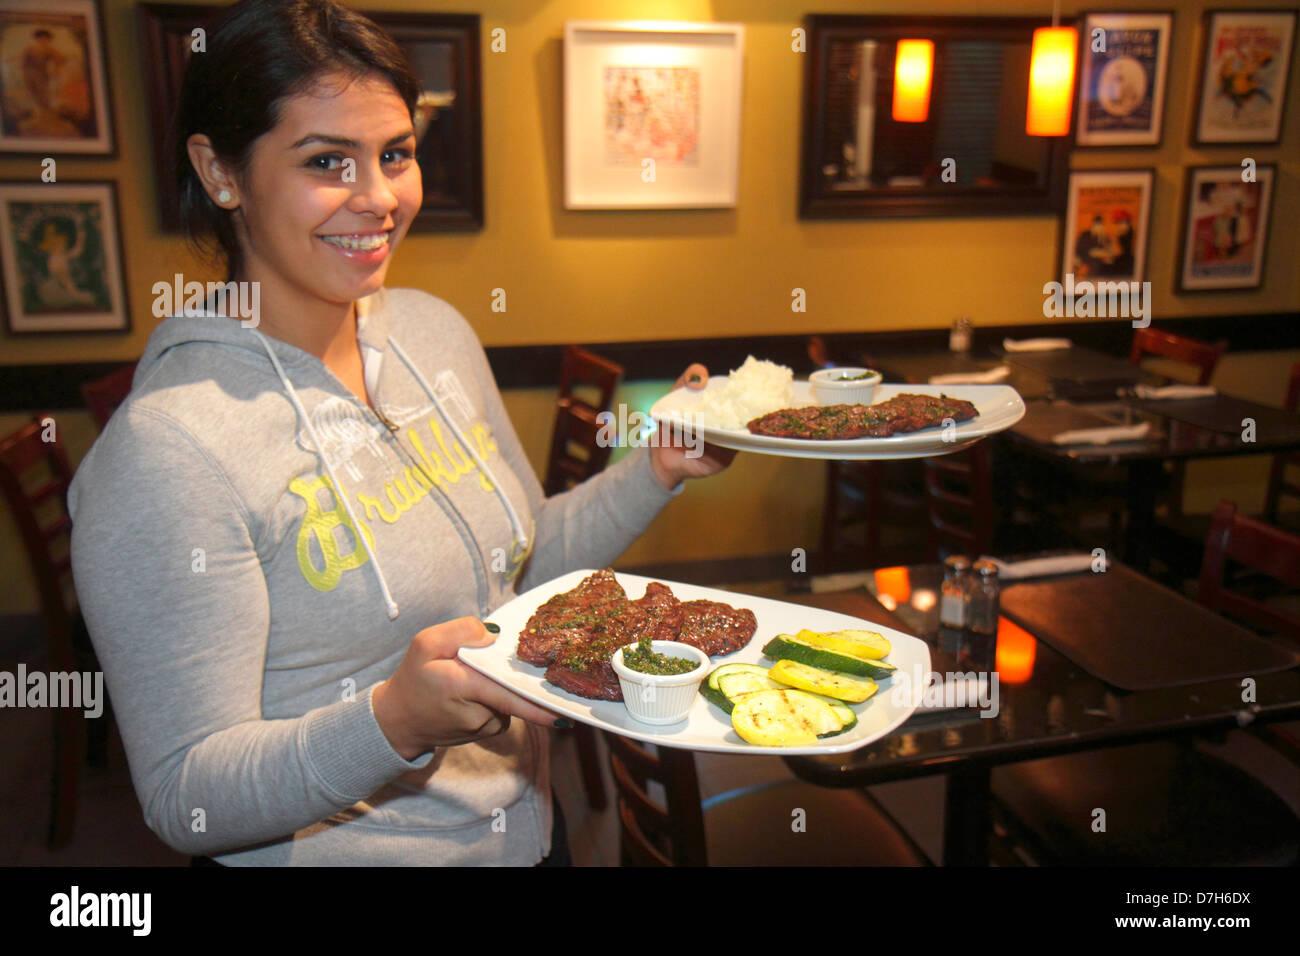 Miami Florida Coral Way 1401 Argentinean Bistro restaurant Hispanic teen girl waitress working job serving plates Stock Photo